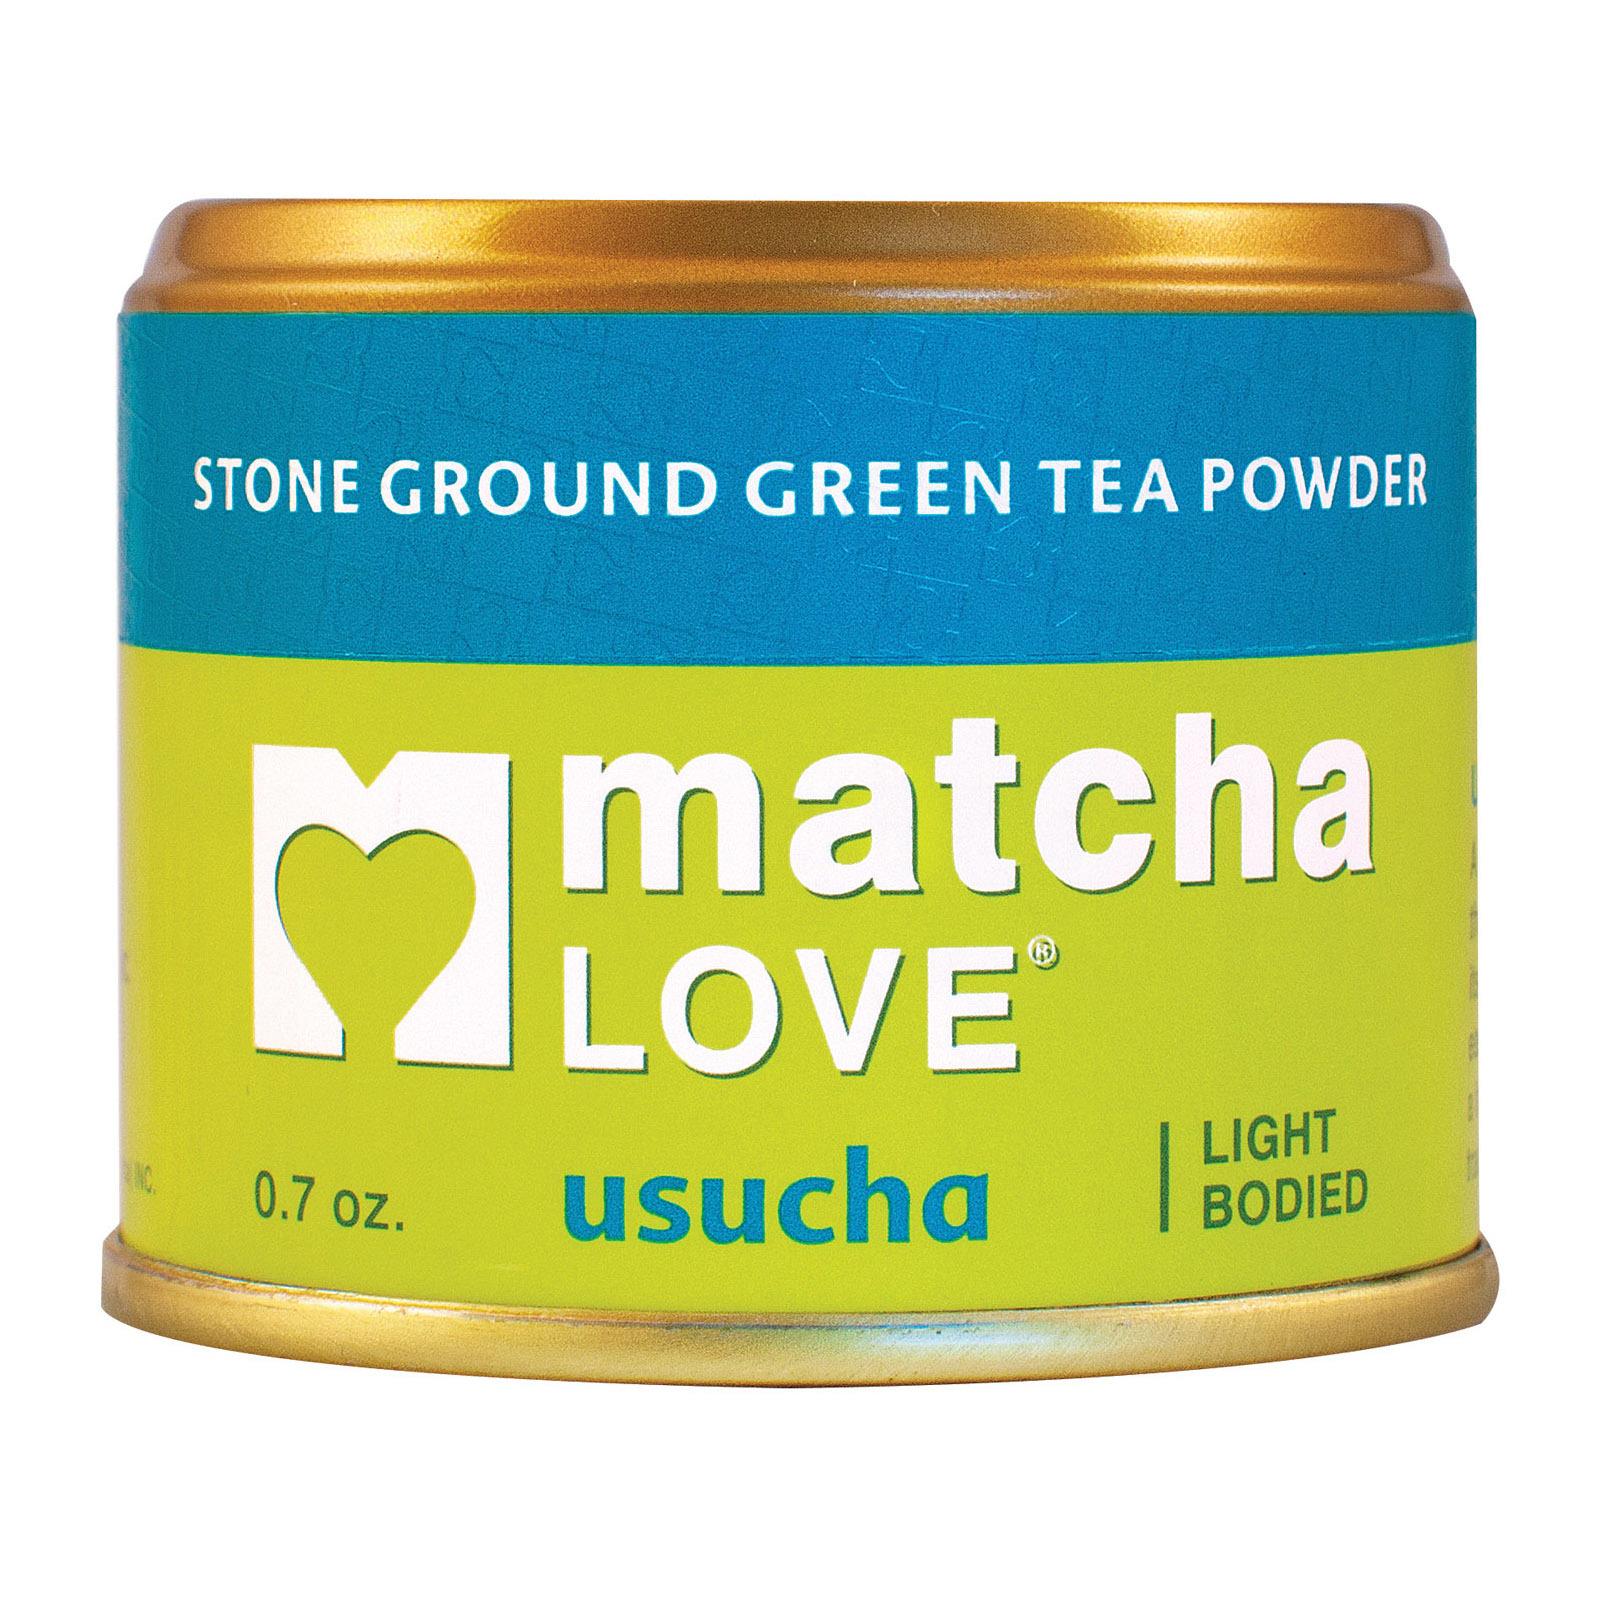 Matcha Love Green Tea Powder - Light Bodied - Case of 10 - 0.7 oz.